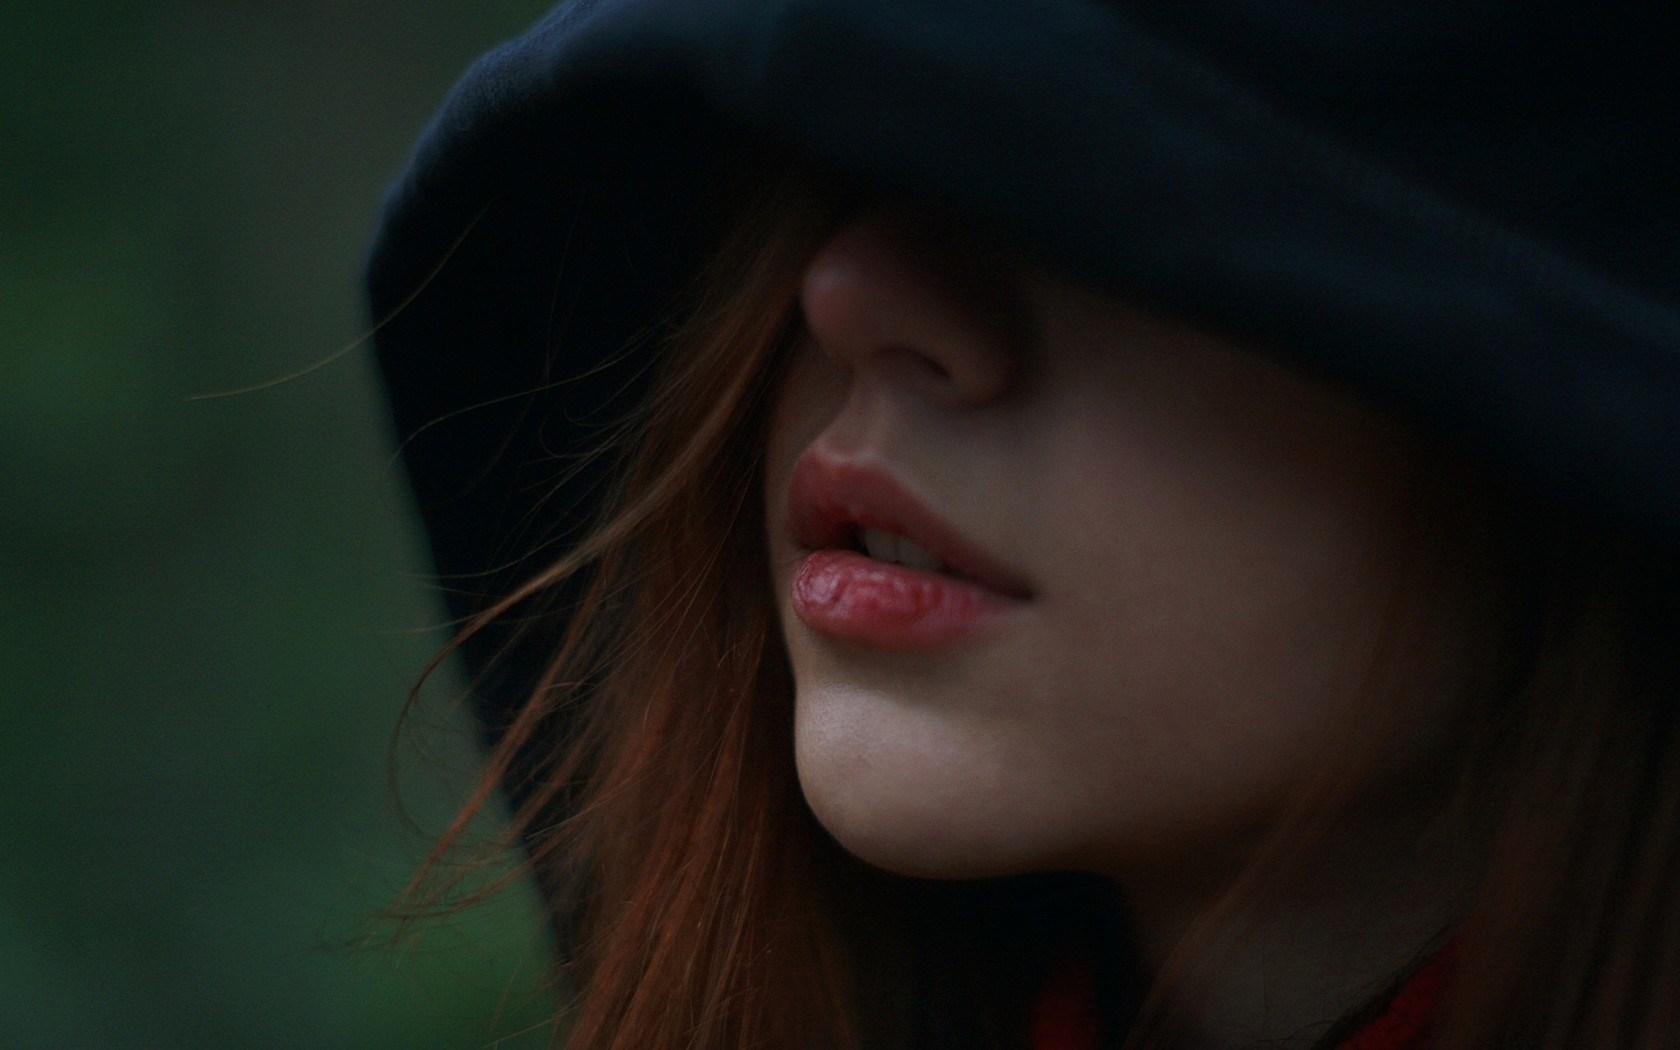 Girl Mouth Lips Mood